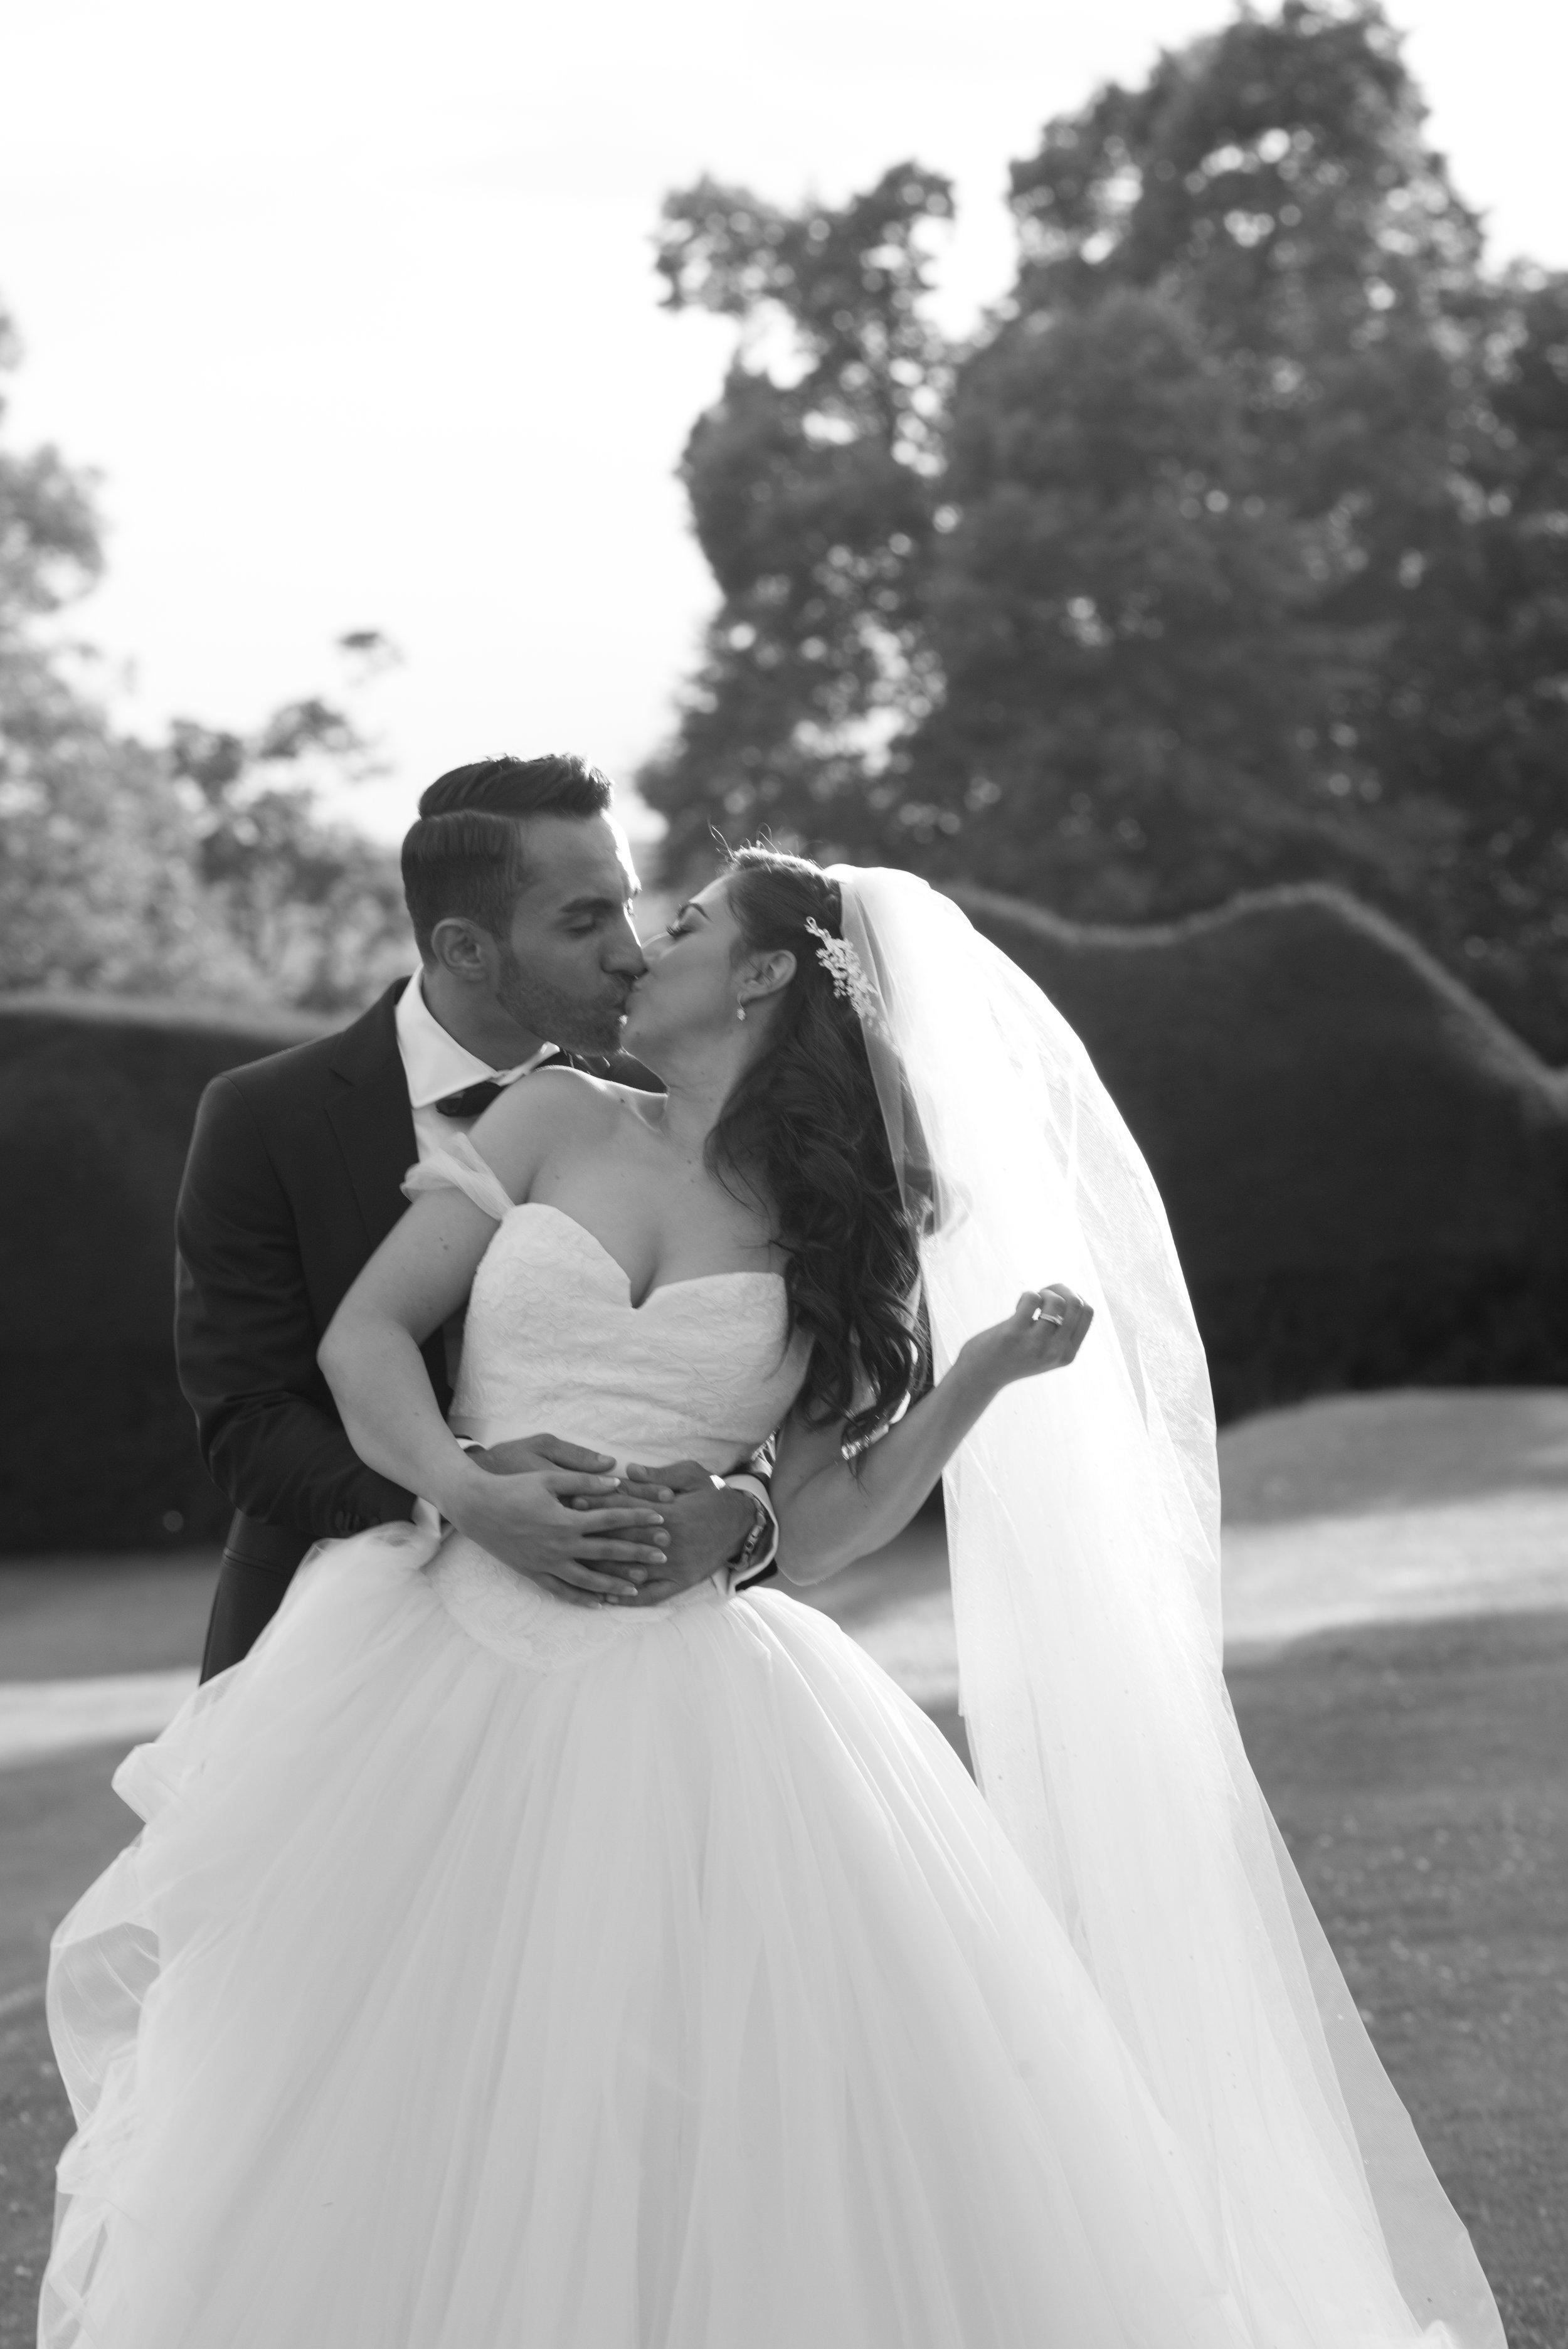 Danesfield House wedding, Vera Wang wedding dress, Buckinghamshire wedding photography,